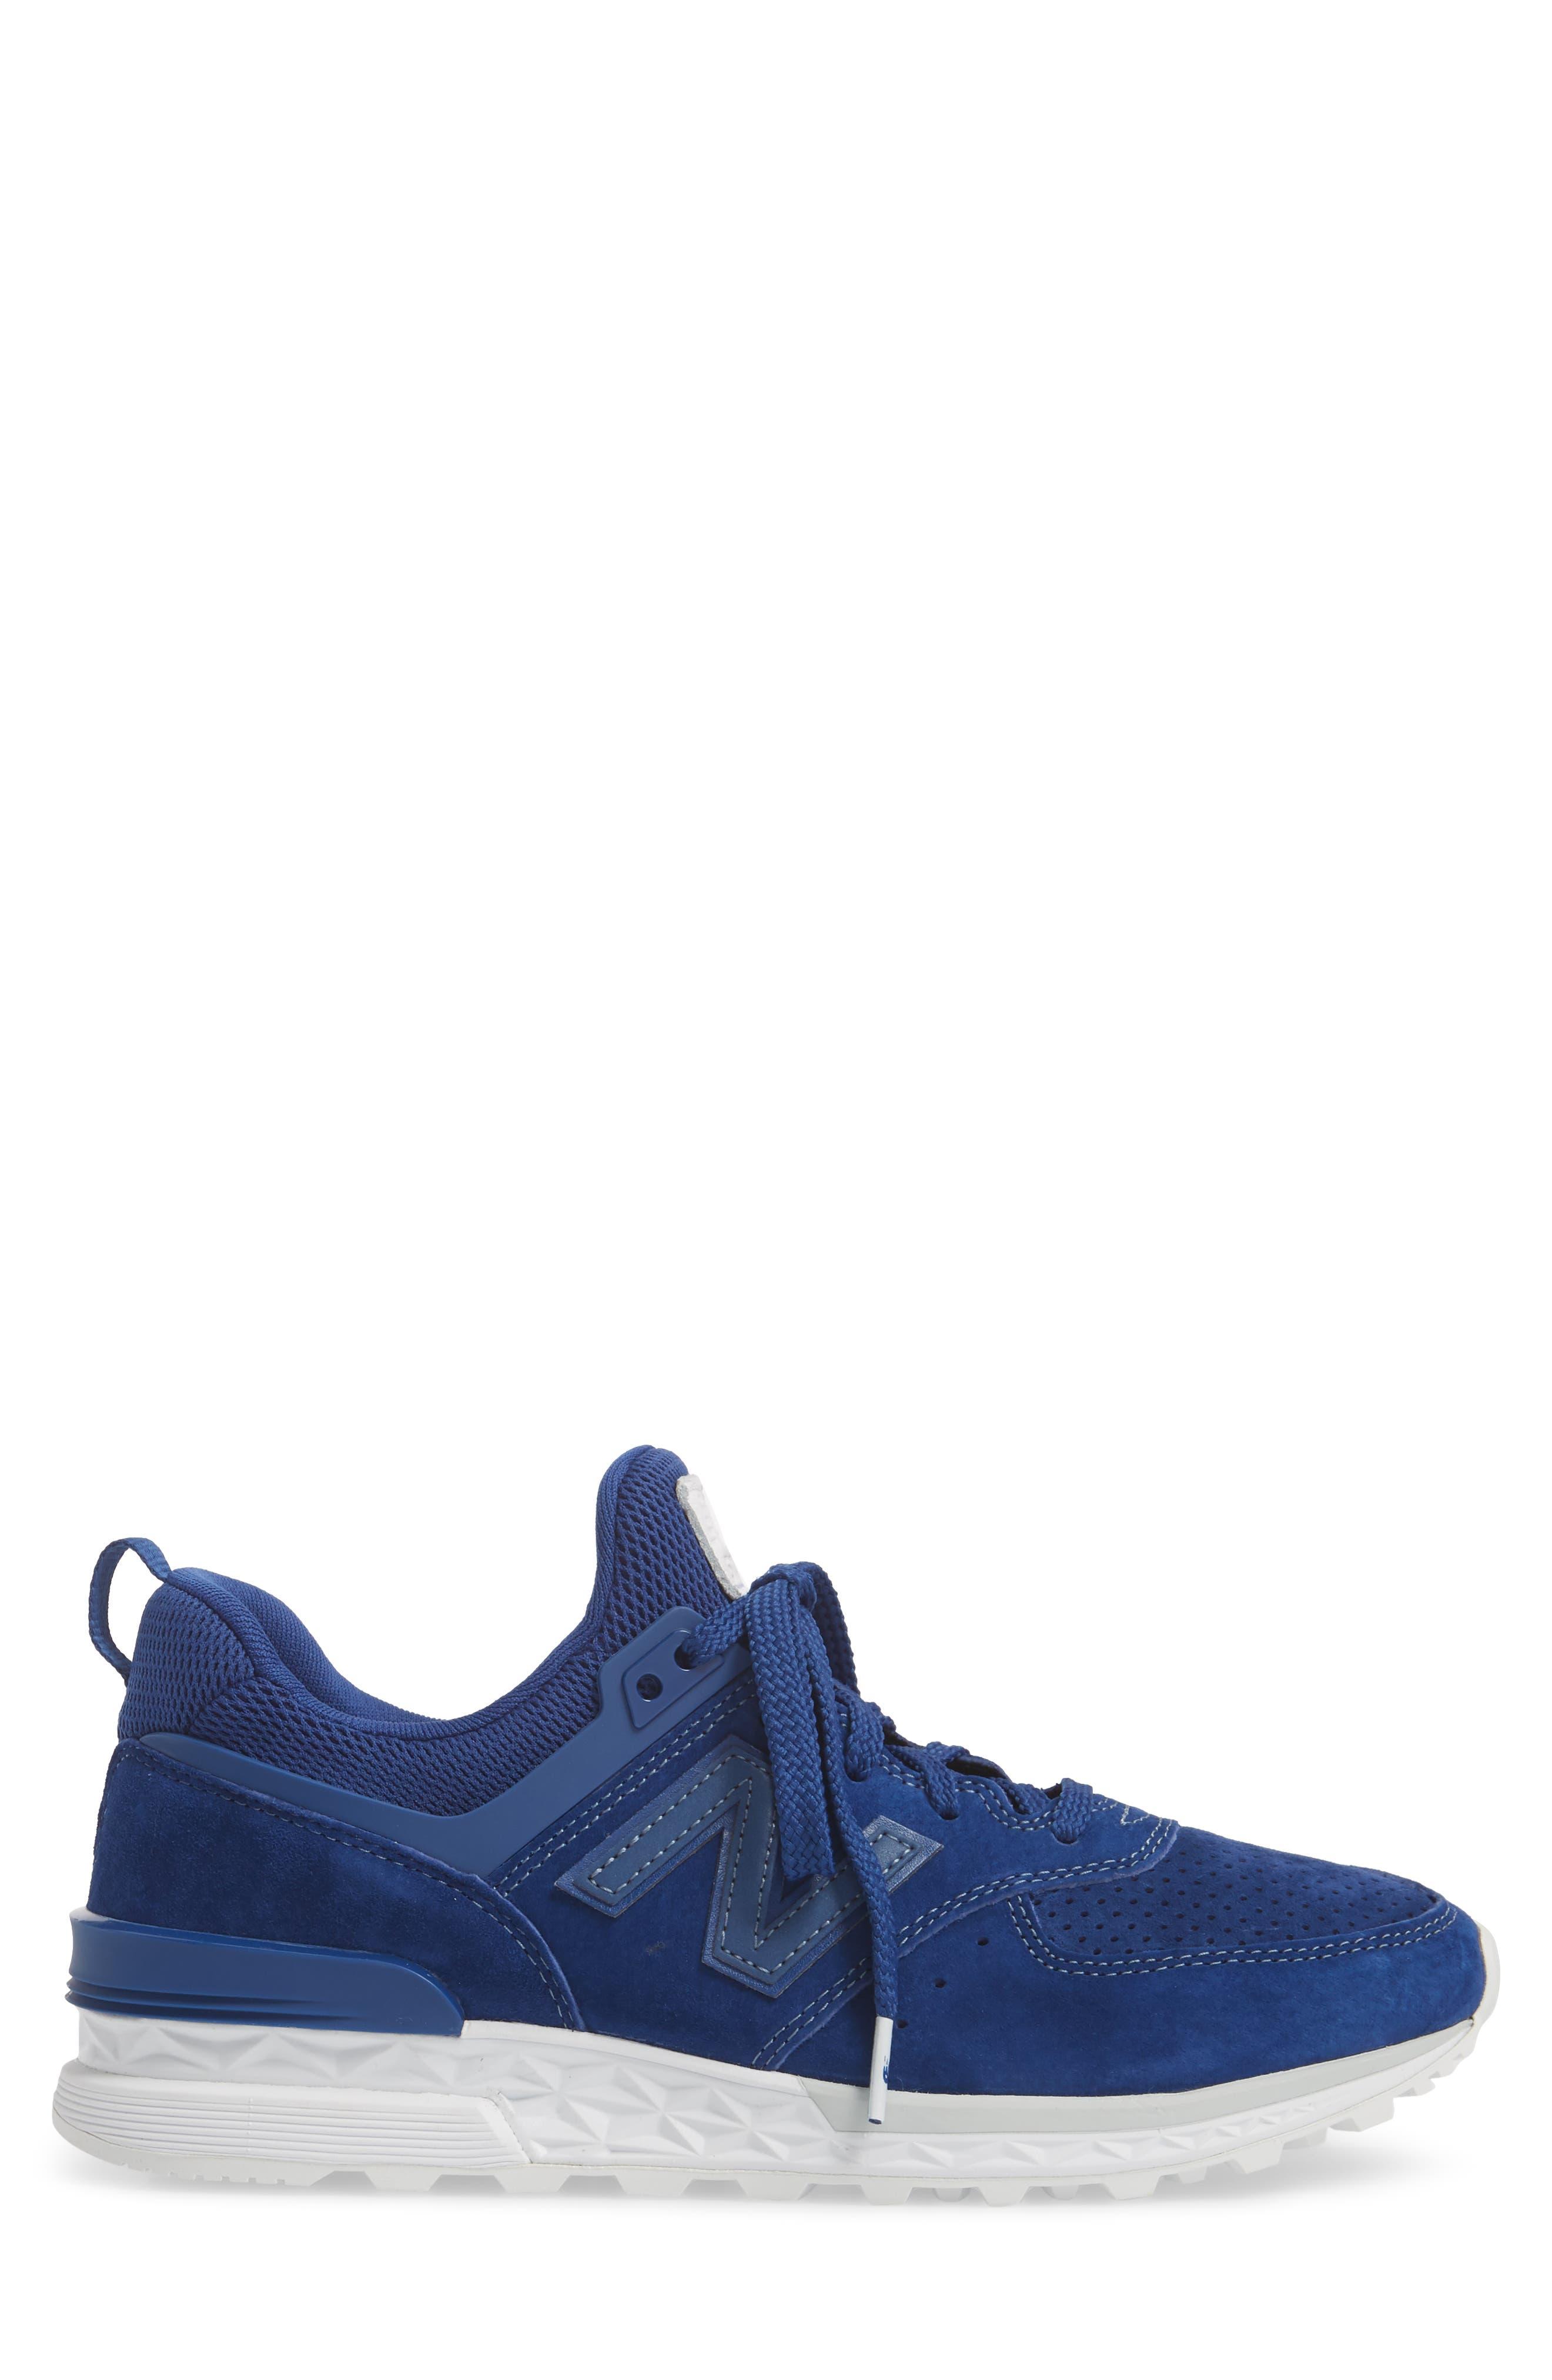 574 Sport Sneaker,                             Alternate thumbnail 3, color,                             Atlantic